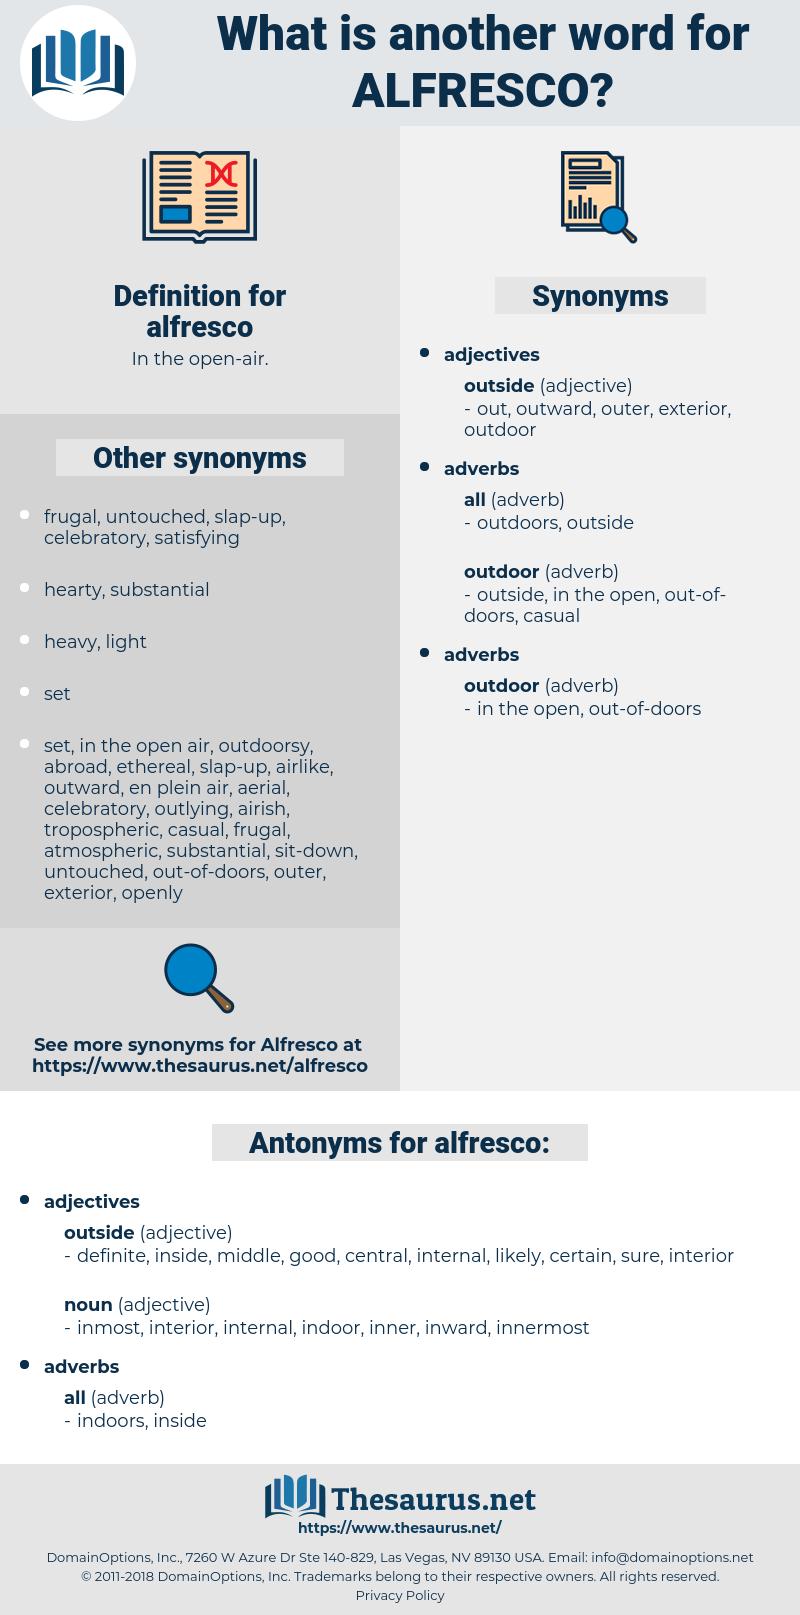 alfresco, synonym alfresco, another word for alfresco, words like alfresco, thesaurus alfresco